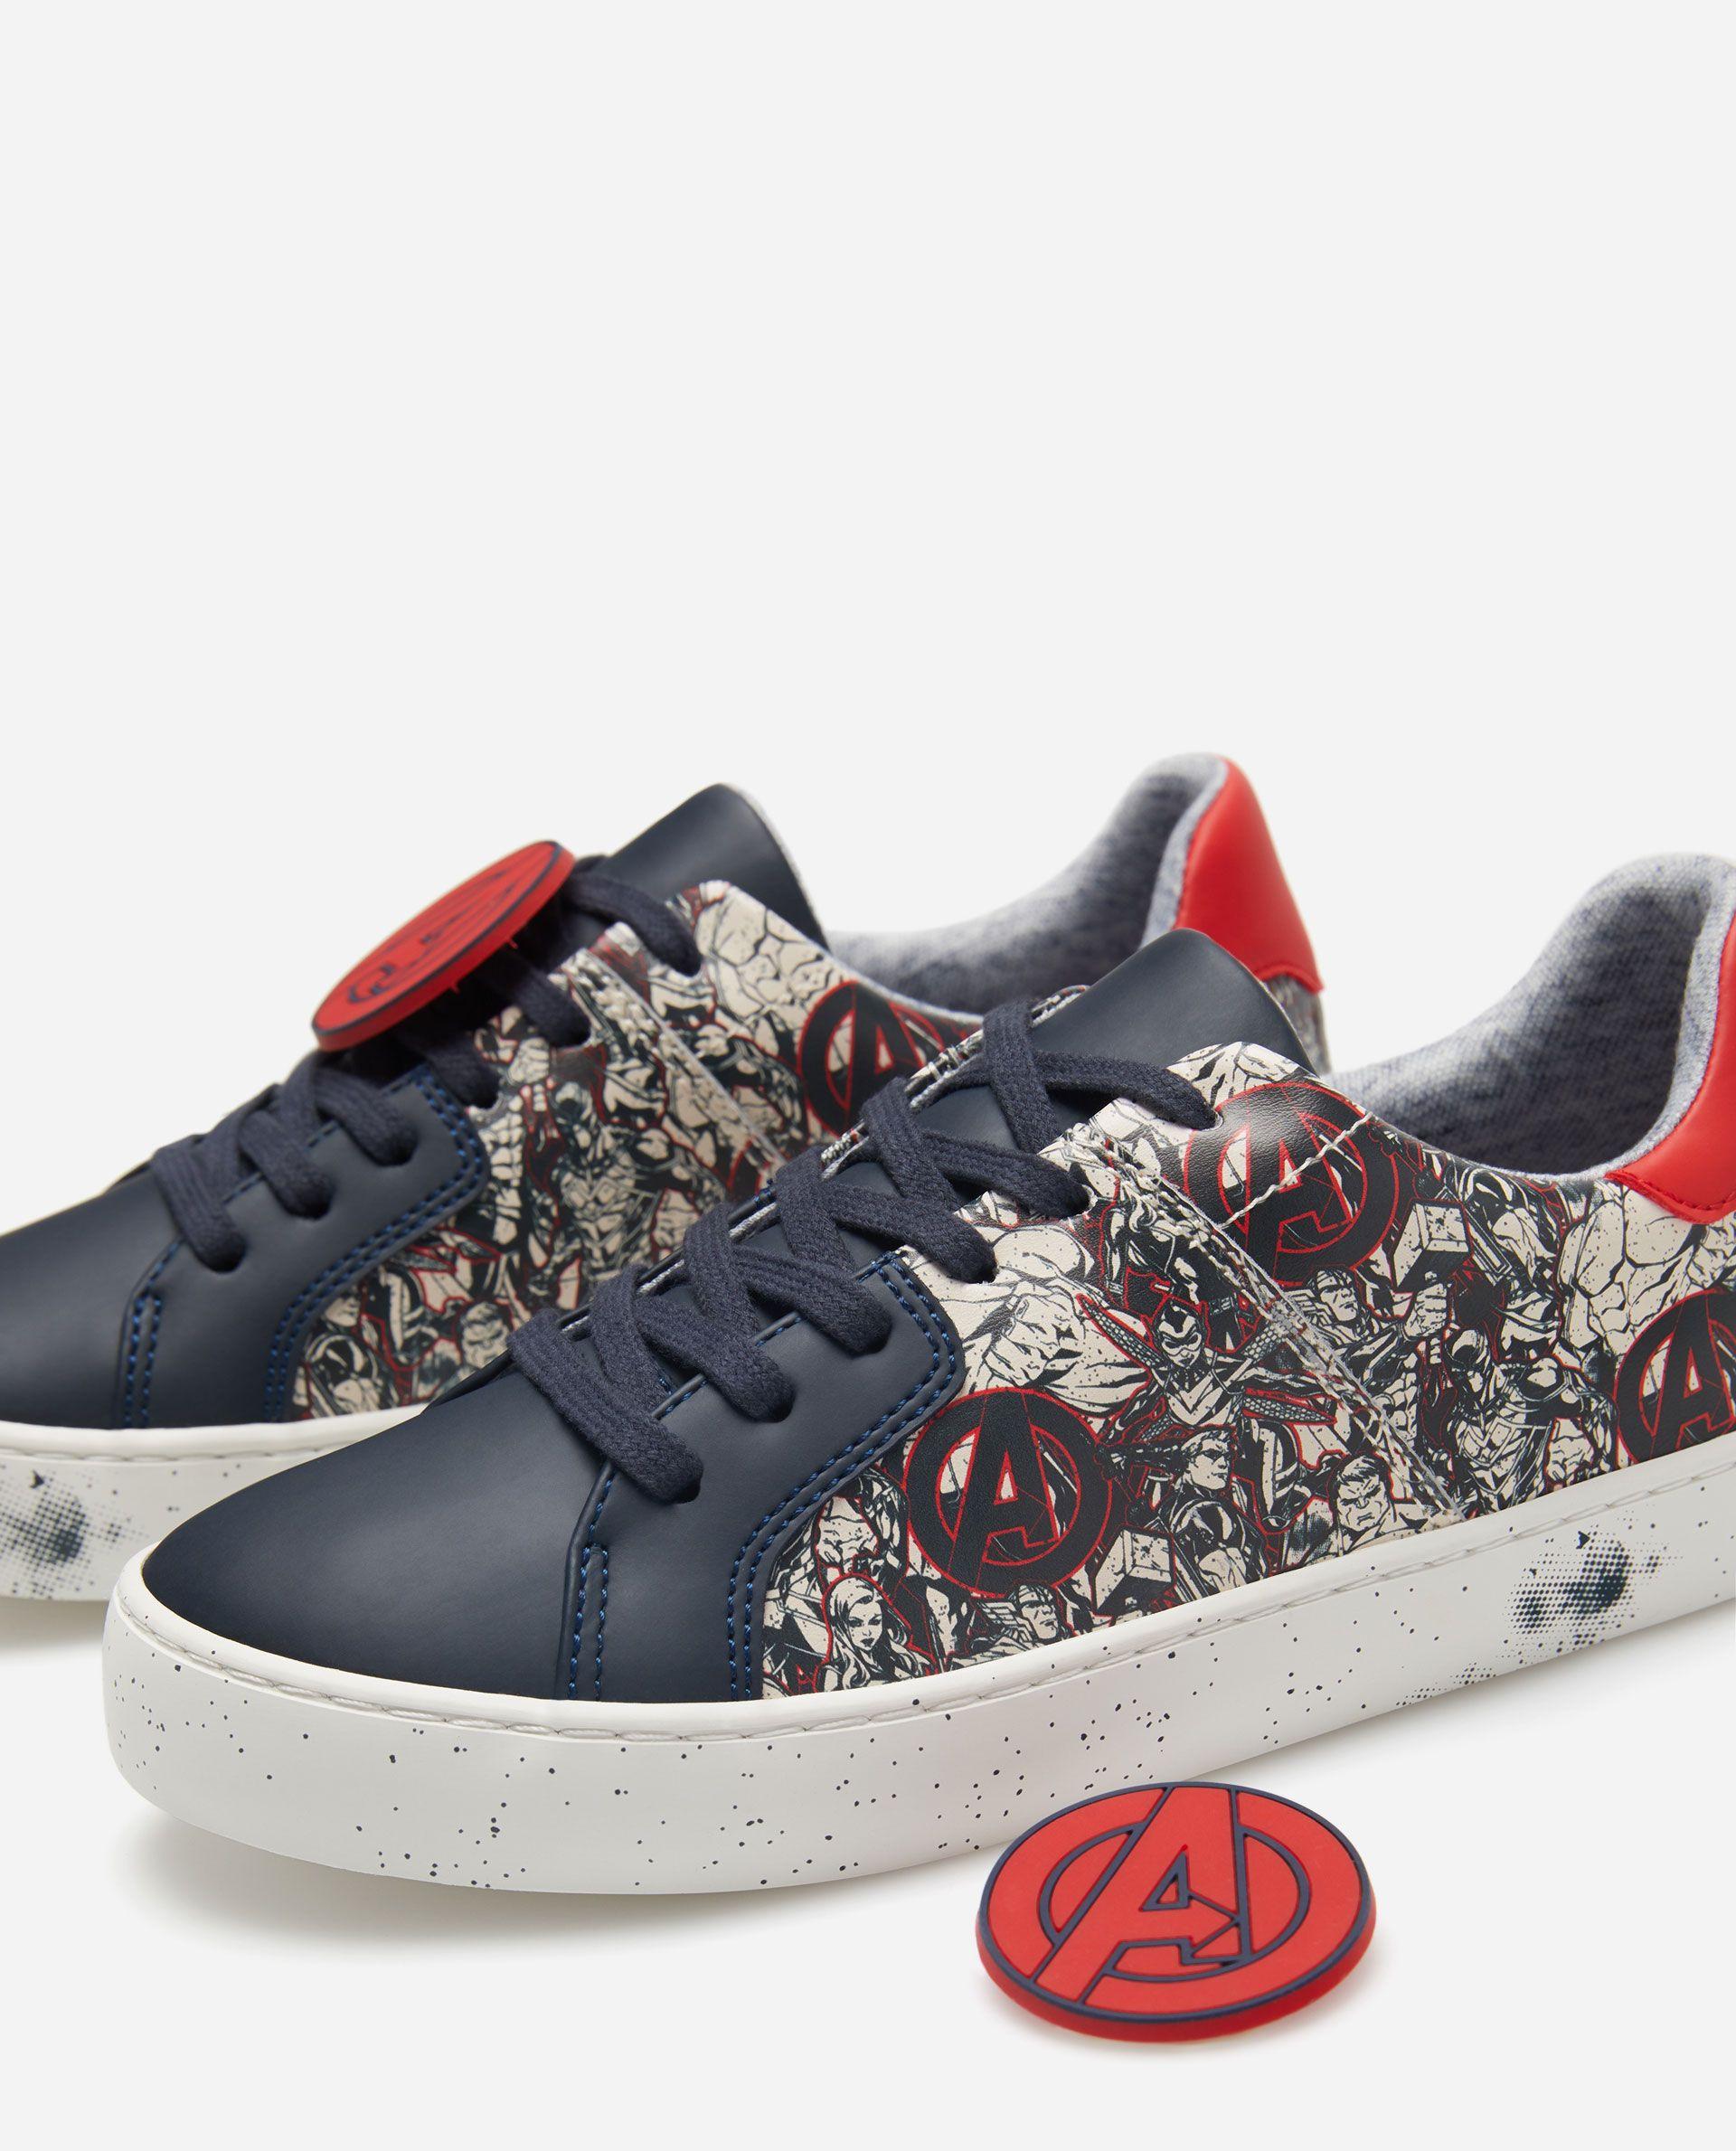 Moda Shoes 2019 Bamba En Pinterest Y Footwear Parche Avengers wBx4qRp